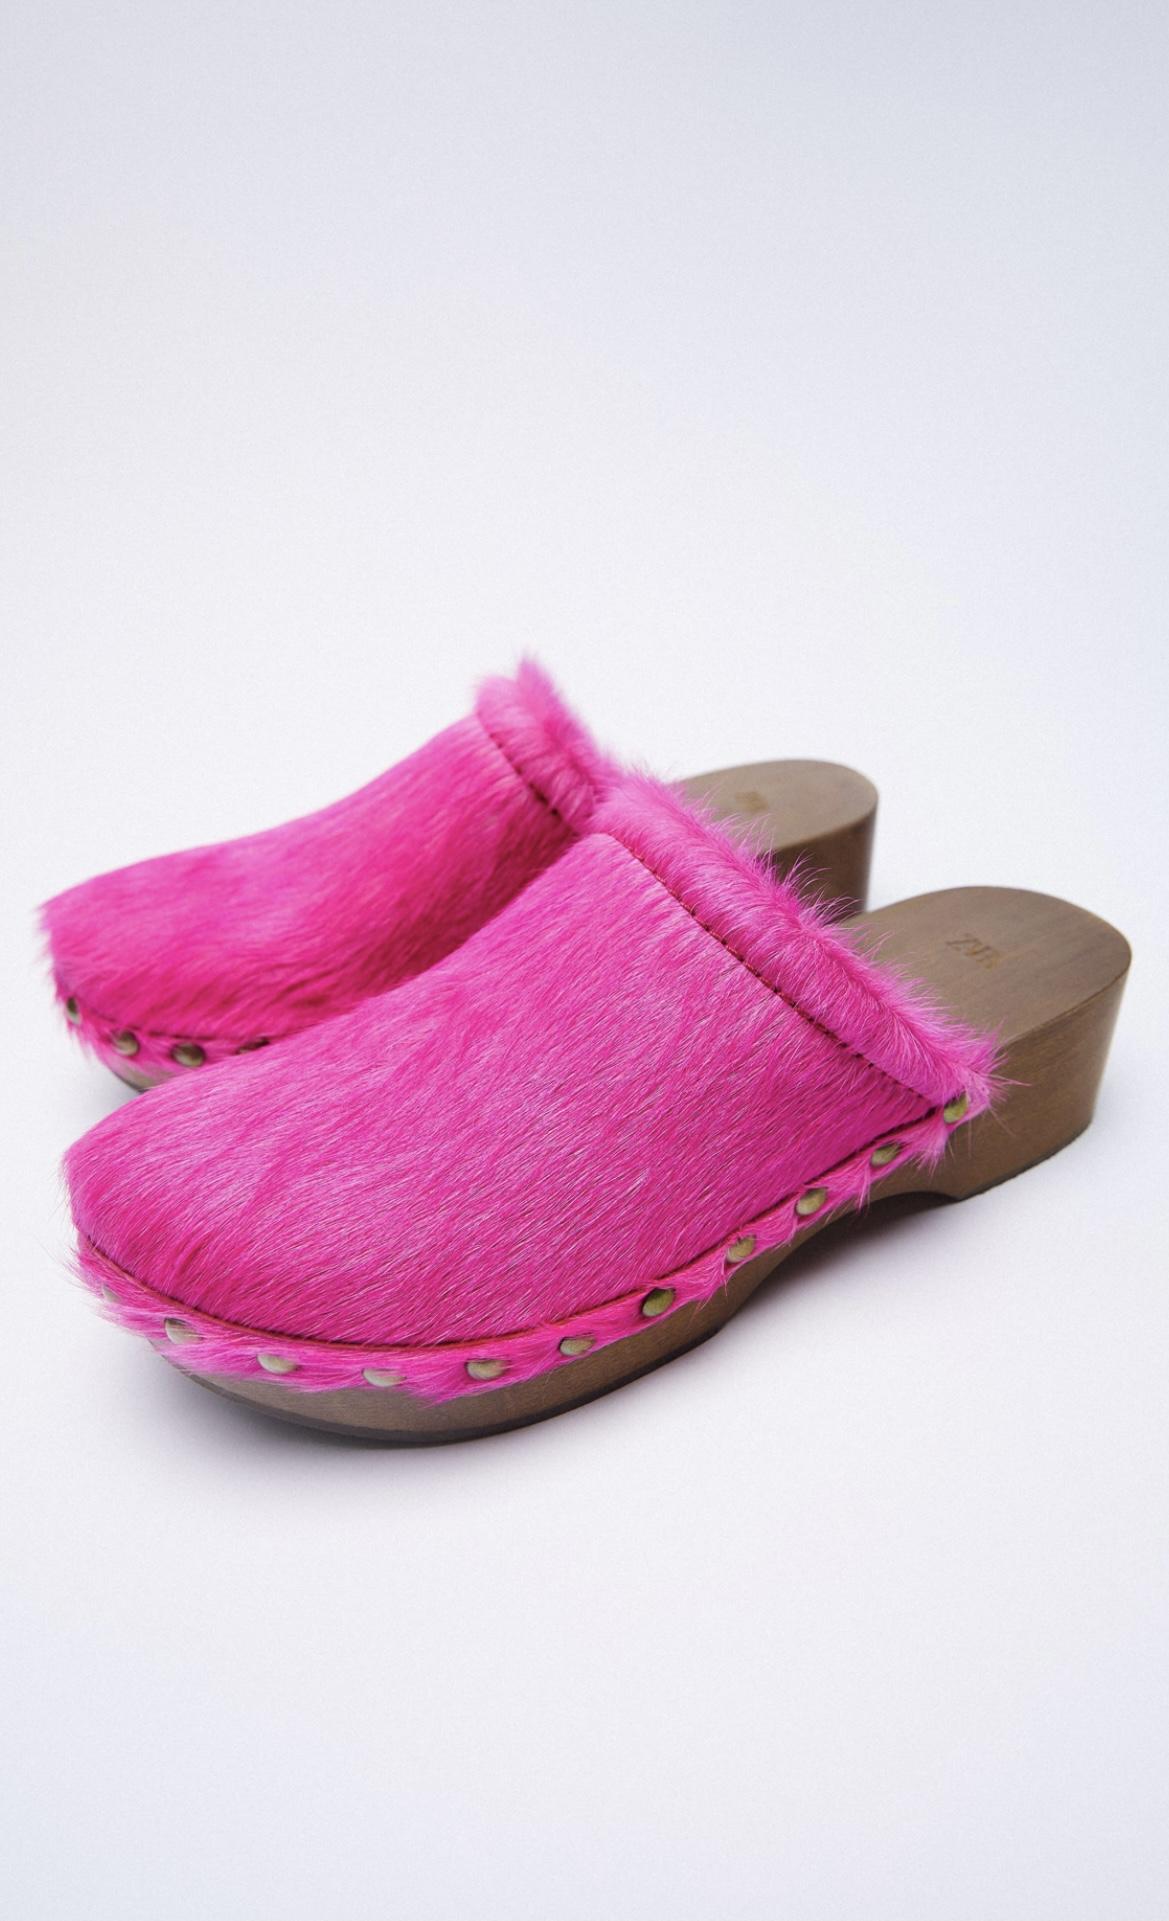 Zara, 4 699 грн